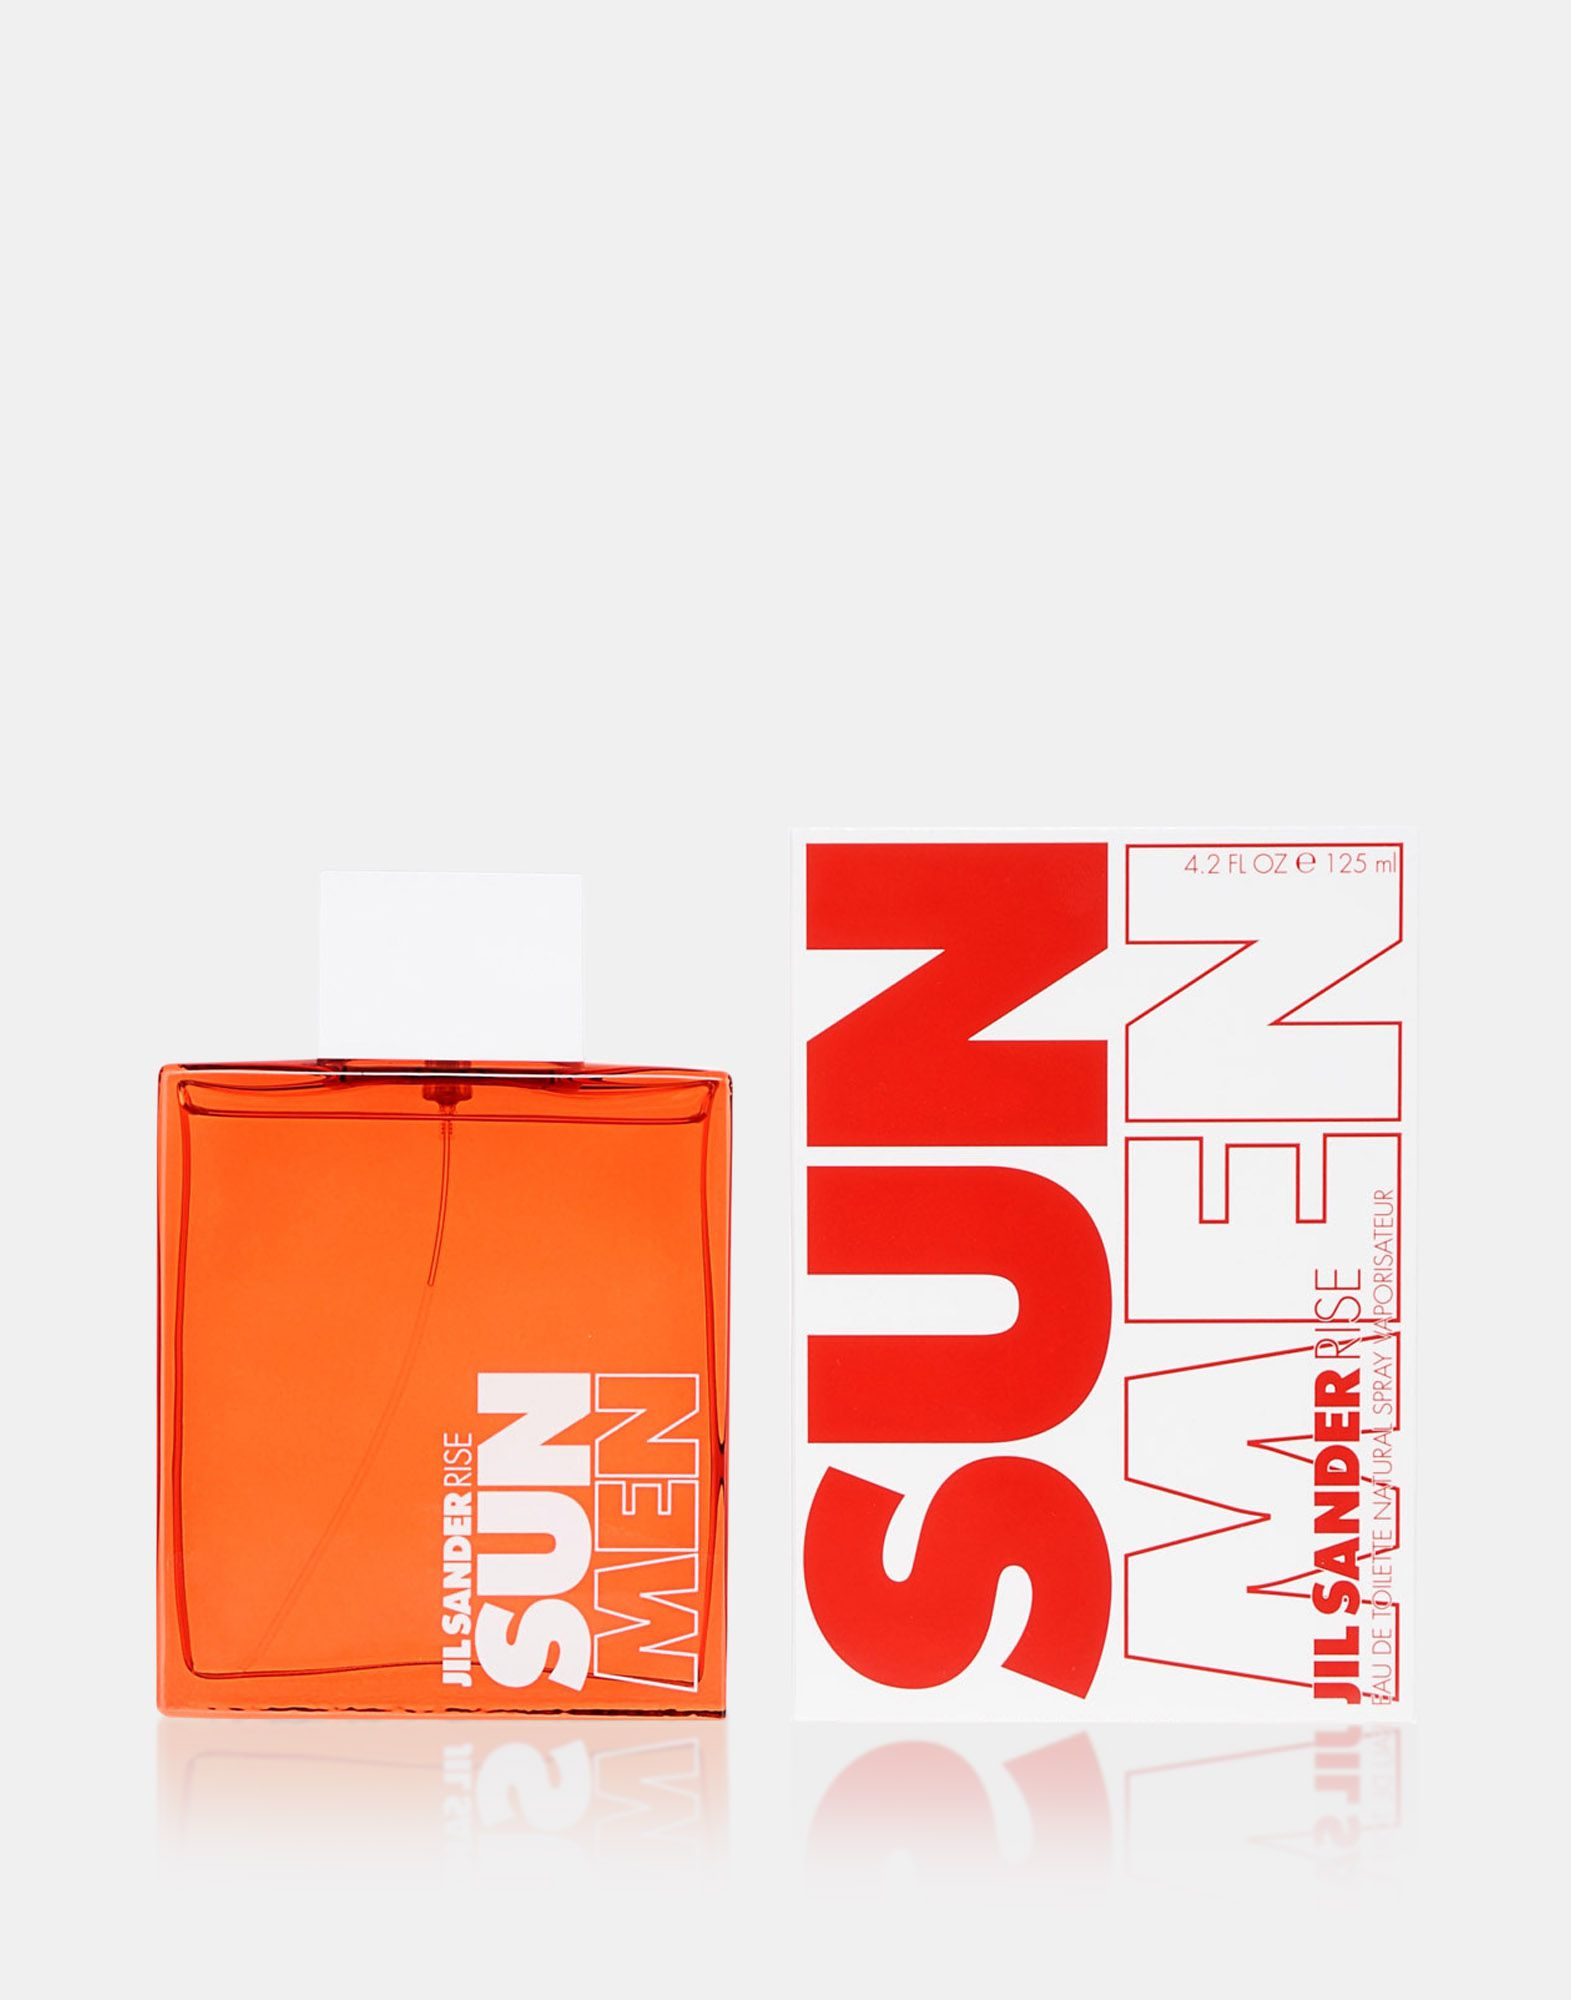 SUN RISE MEN - JIL SANDER Online Store